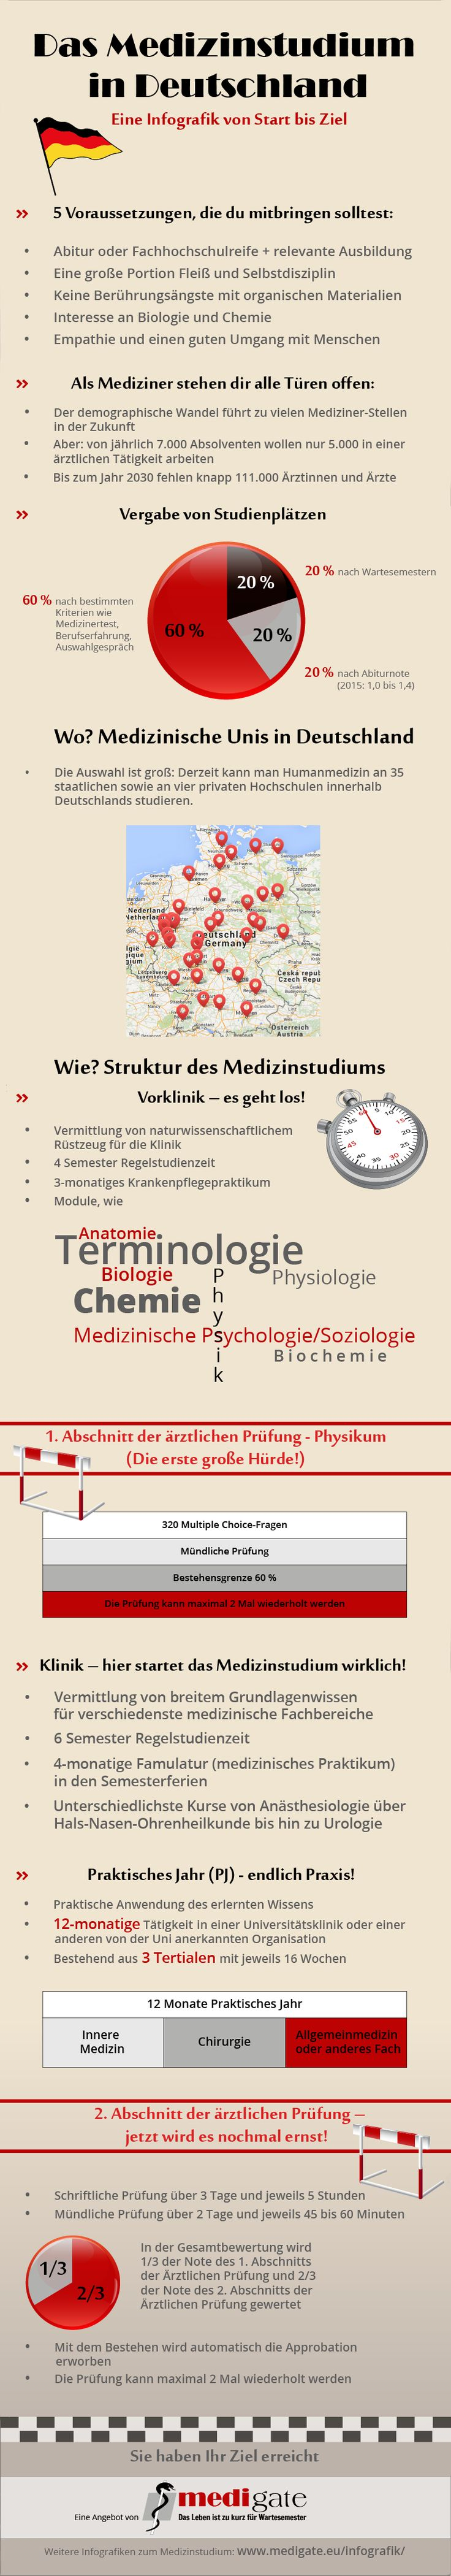 Infografik Medizinstudium in Deutschland